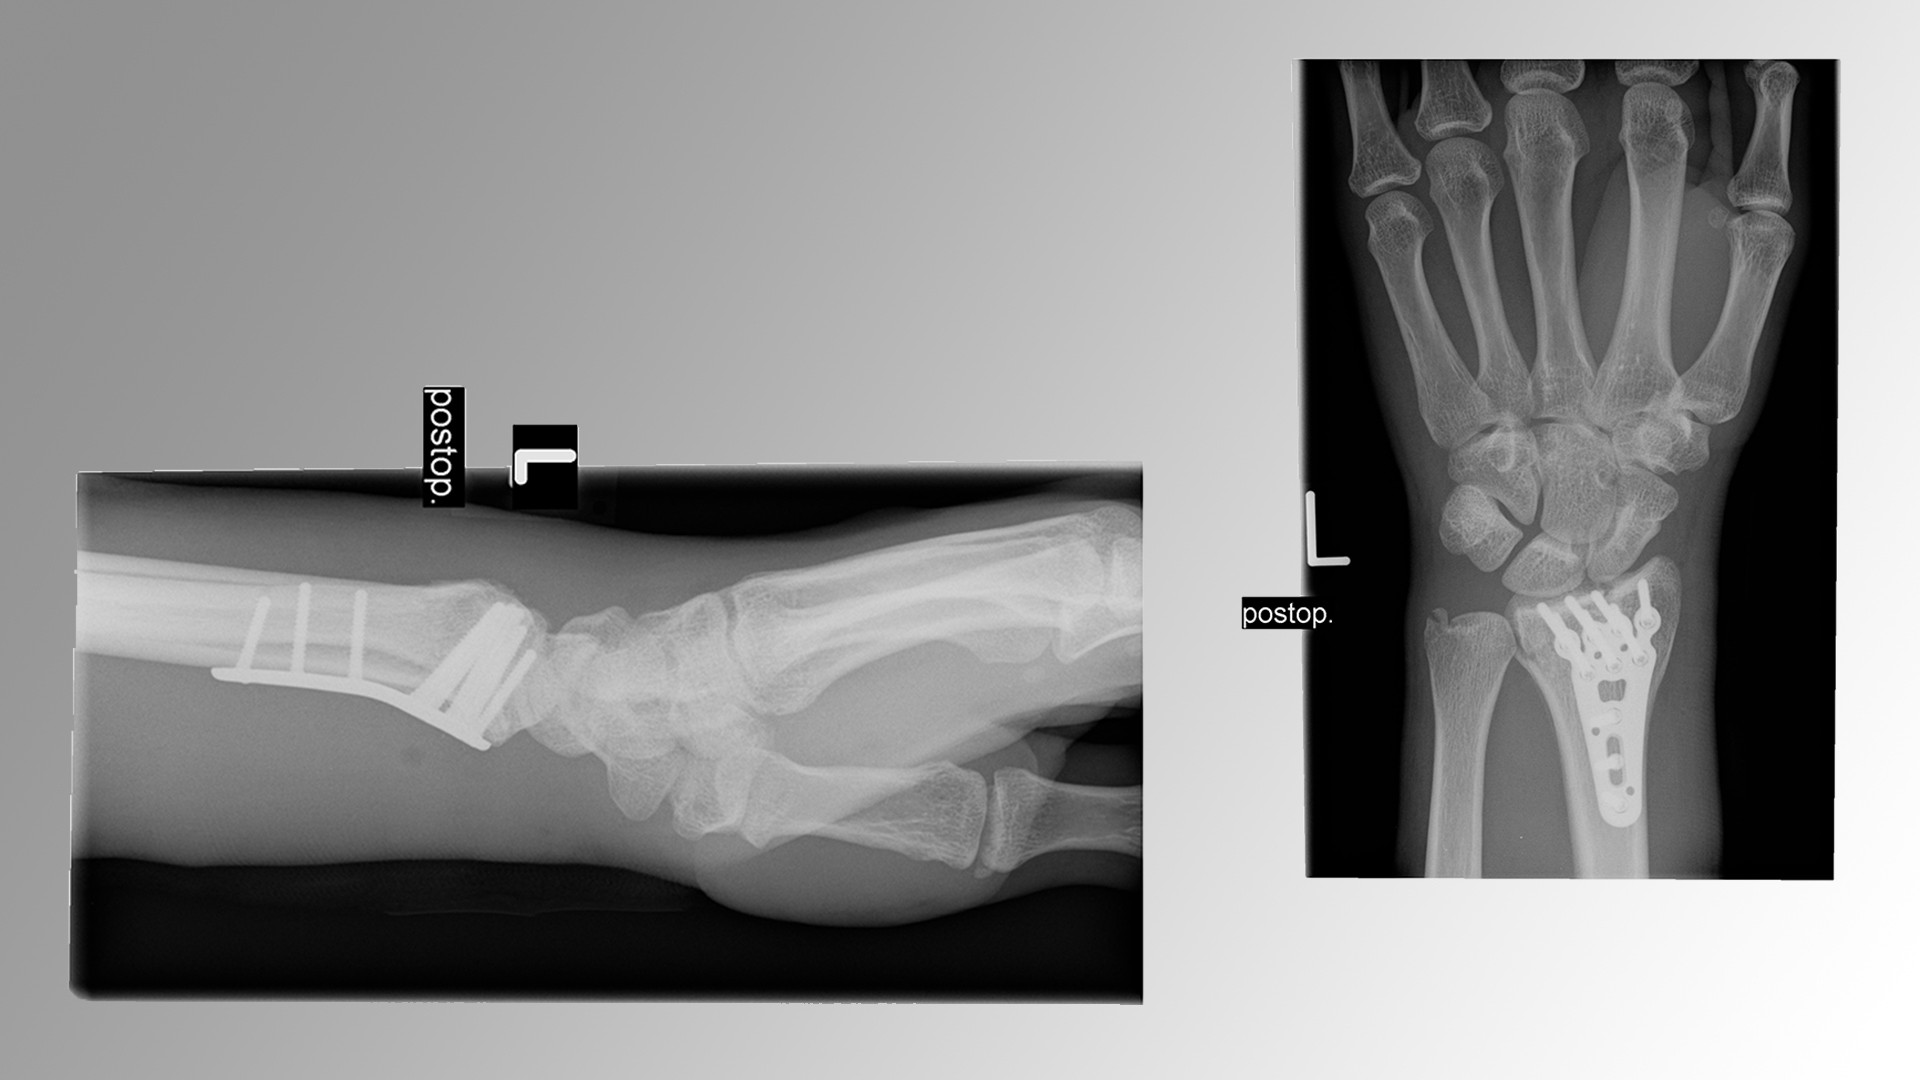 Verletzungsupdate